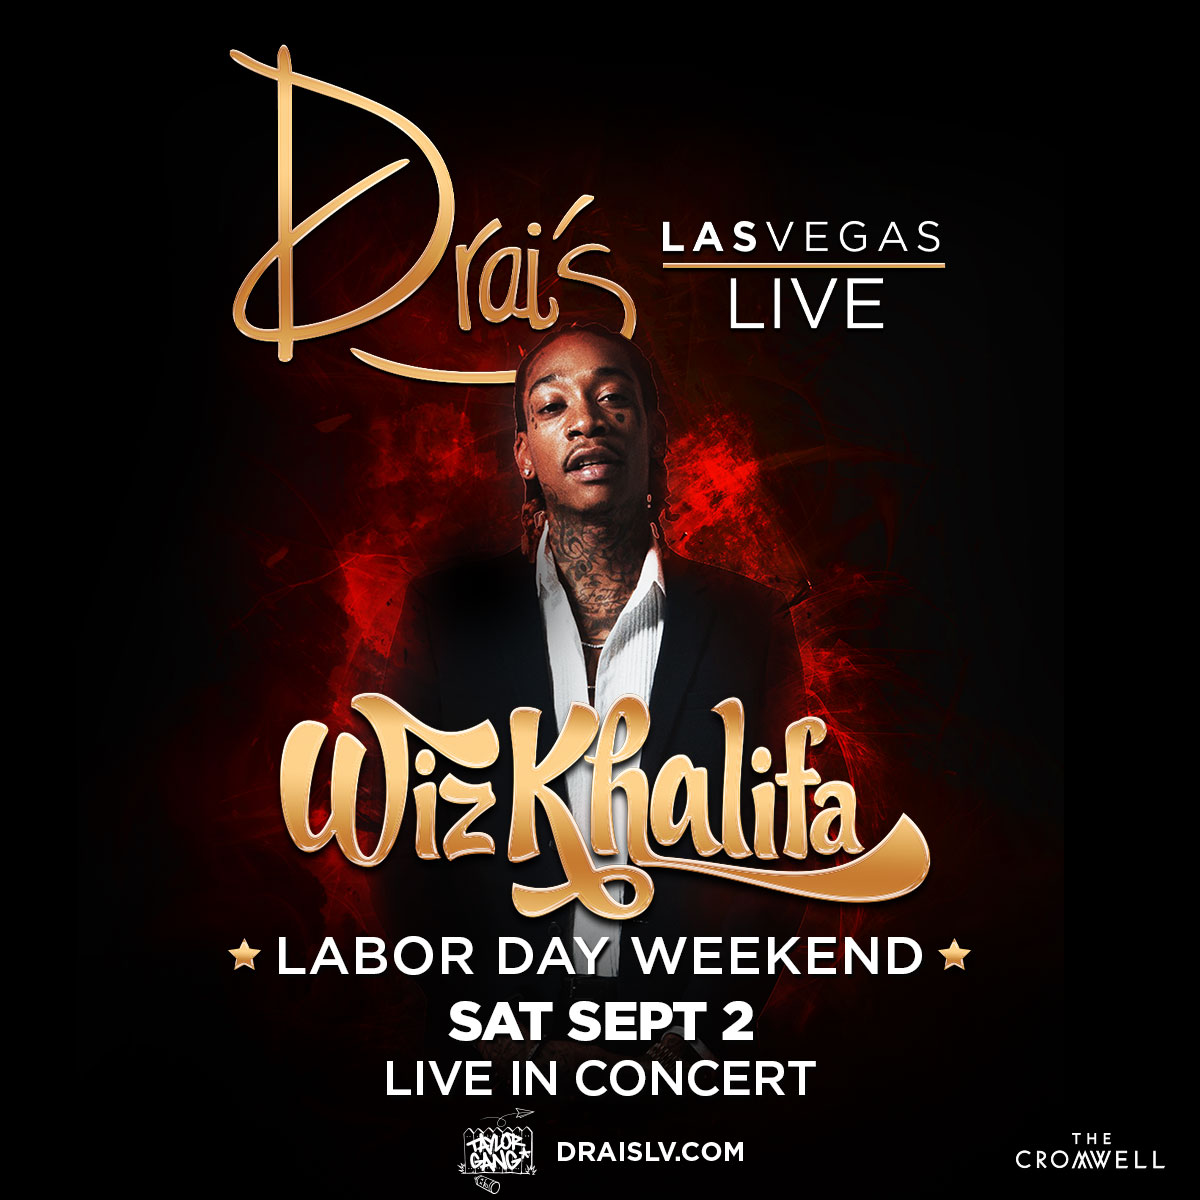 Wiz Khalifa Labor Day Weekend At Drais Nightclub Saturday Sep 2